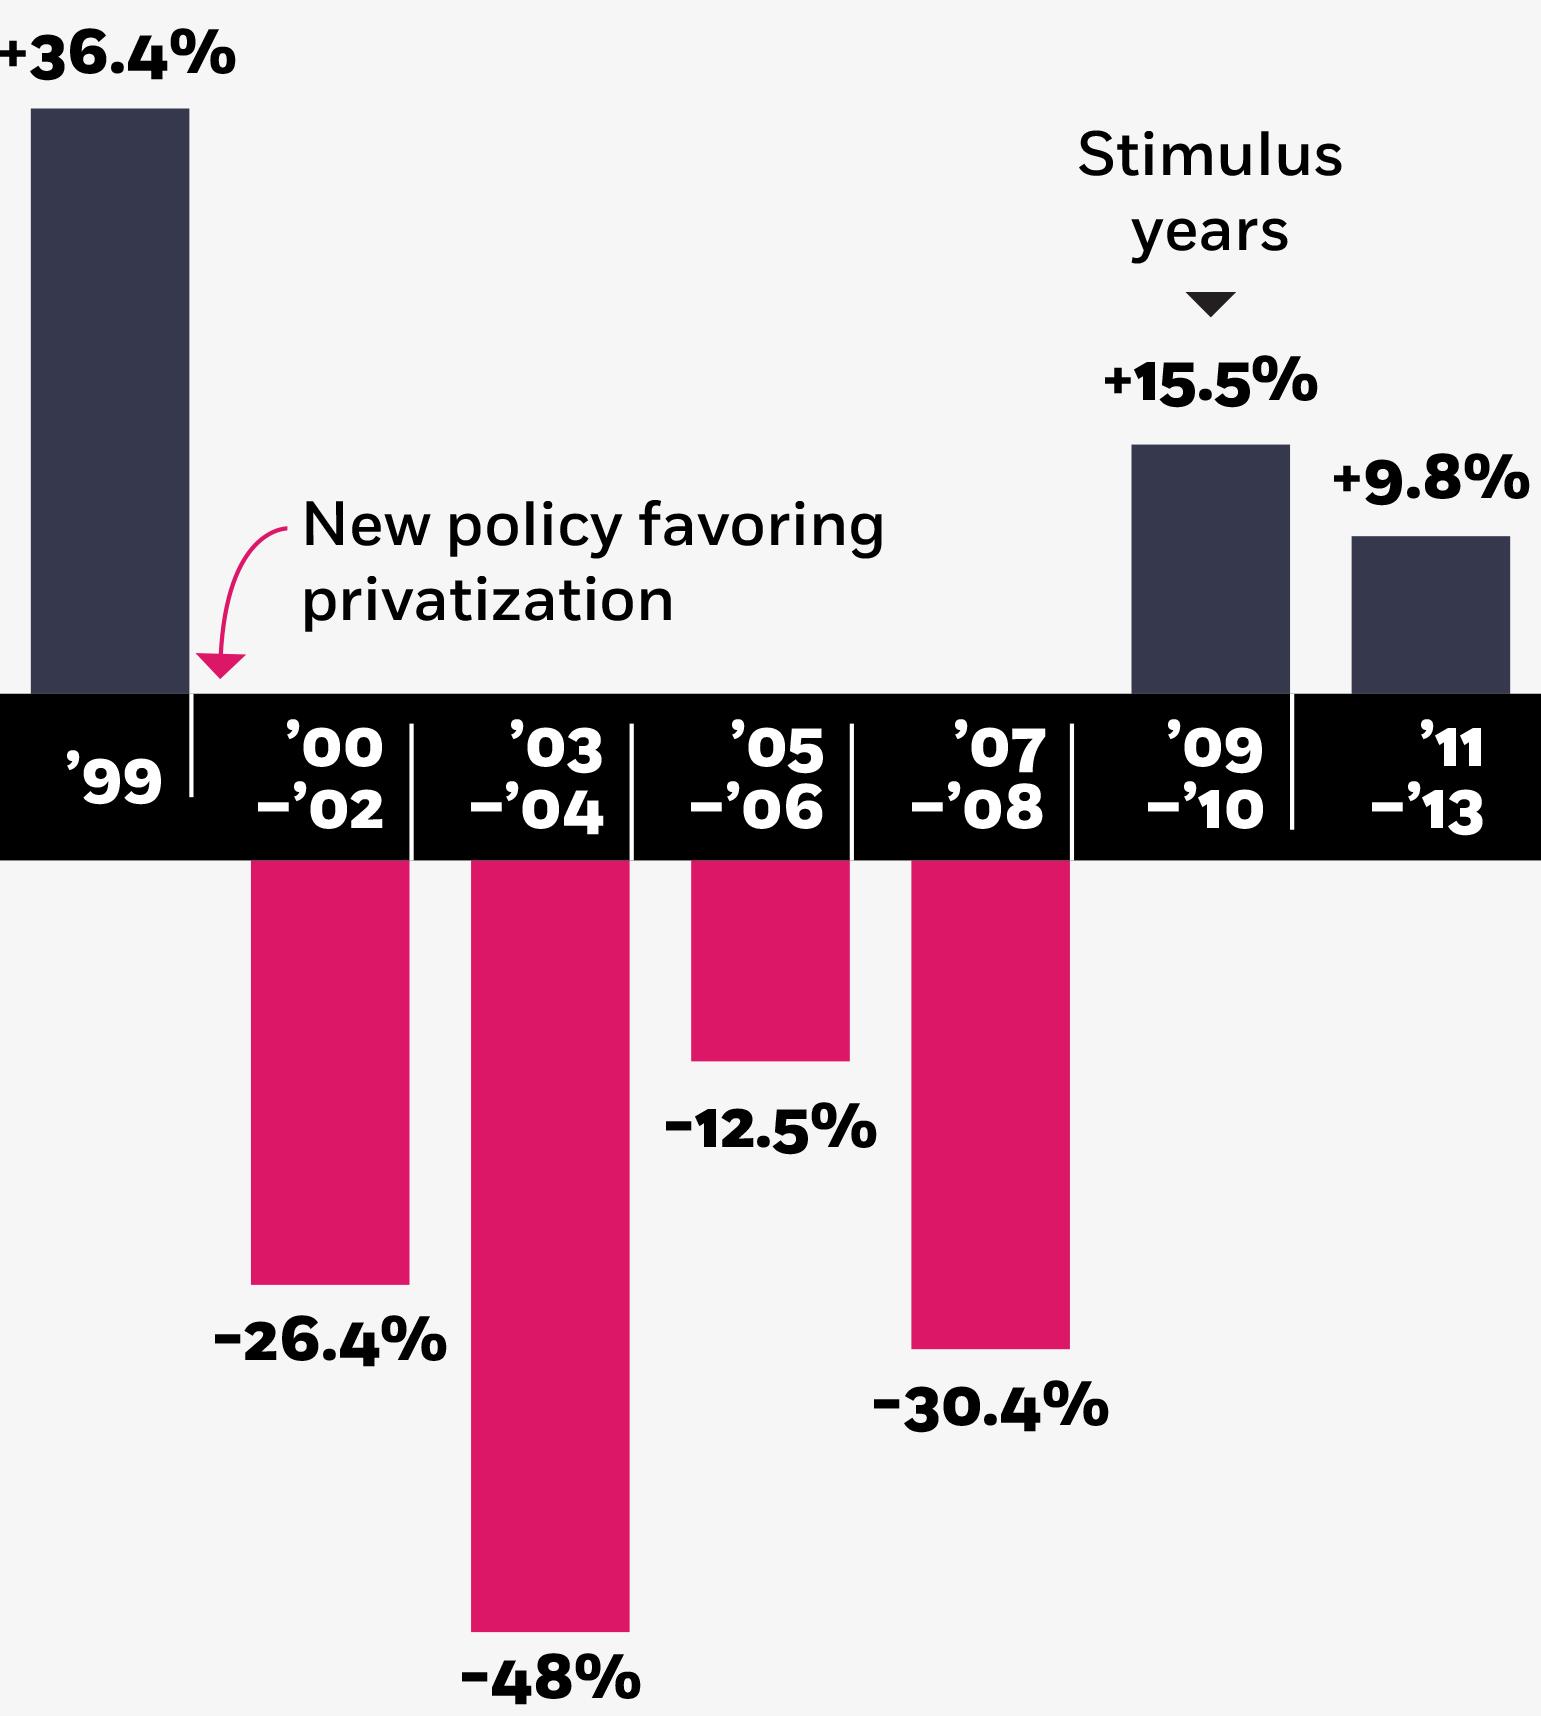 Where China's stimulus program went wrong